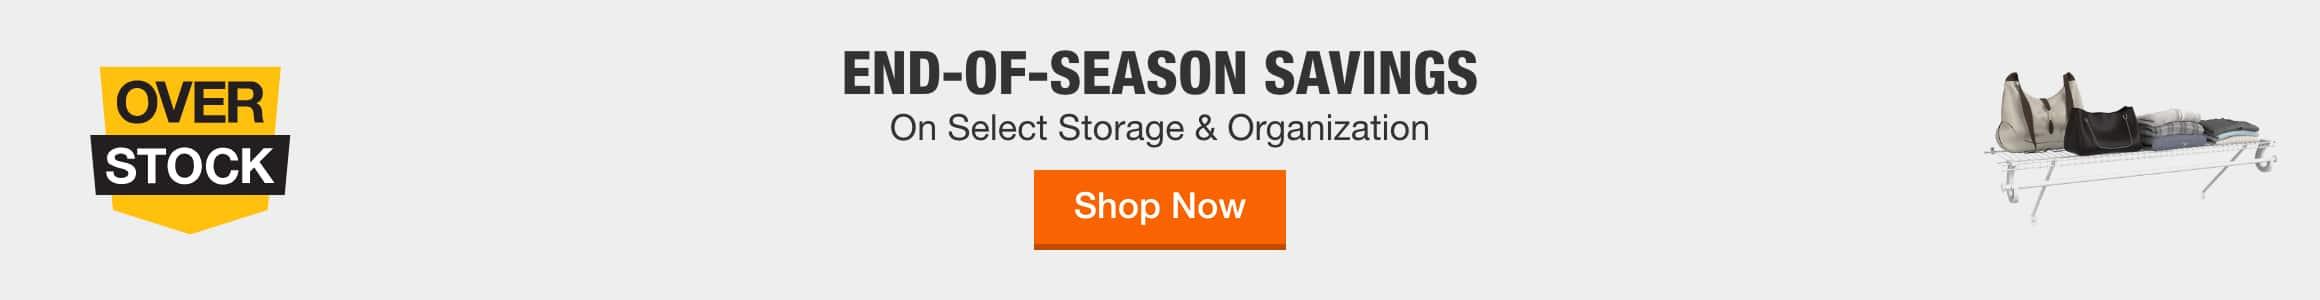 END-OF-SEASON SAVINGS On Select Storage & Organization. Shop Now